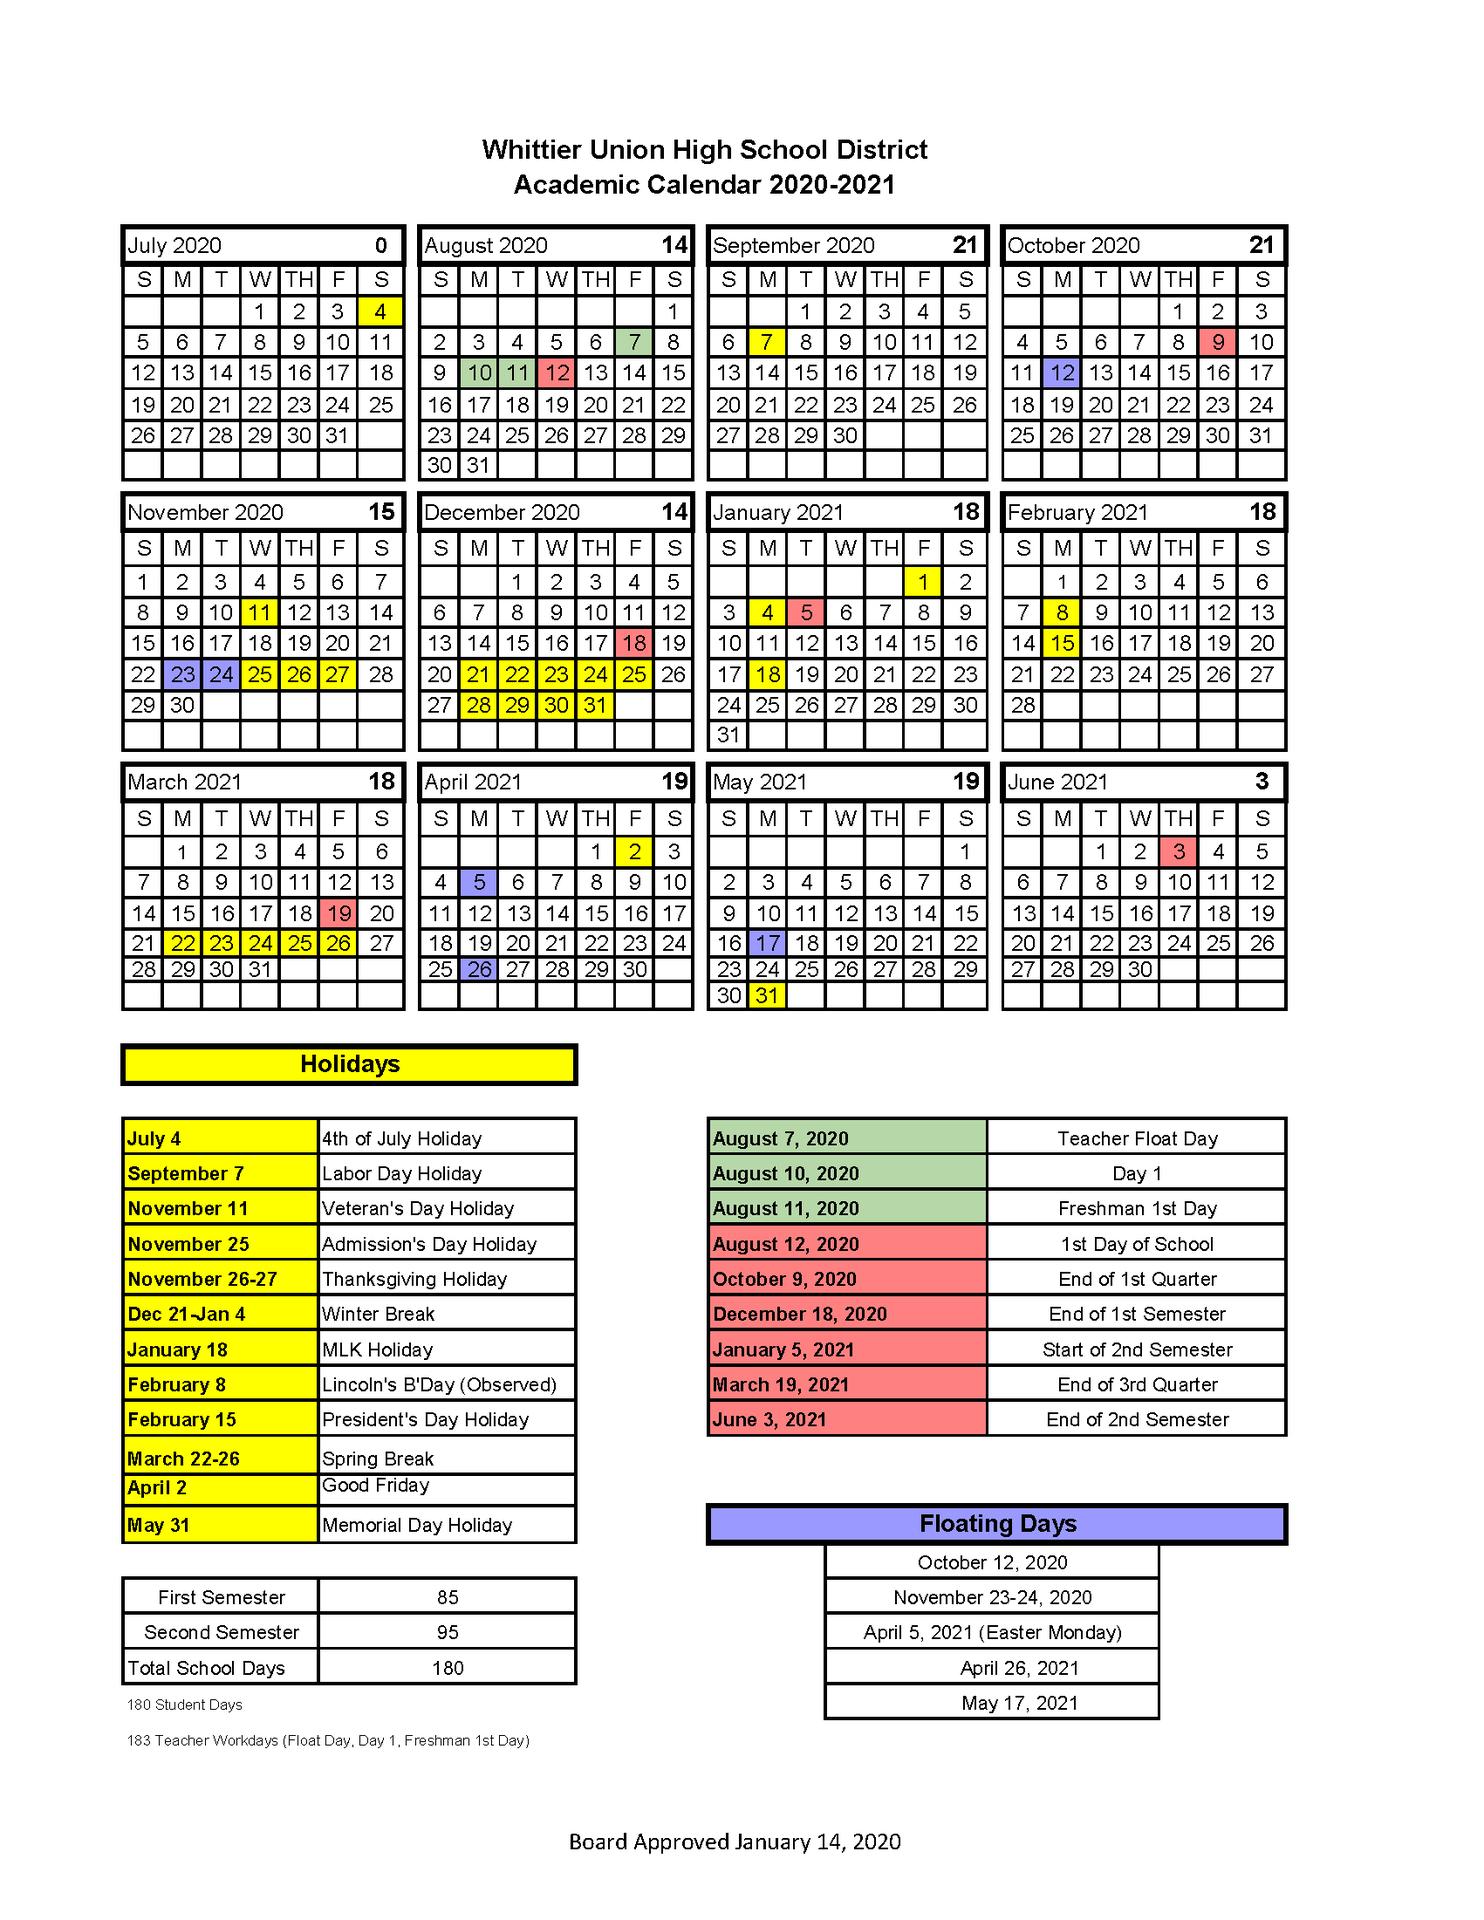 Monterey County Court Calendar | Printable Calendar 2020 2021 For Nc District Court Calendar